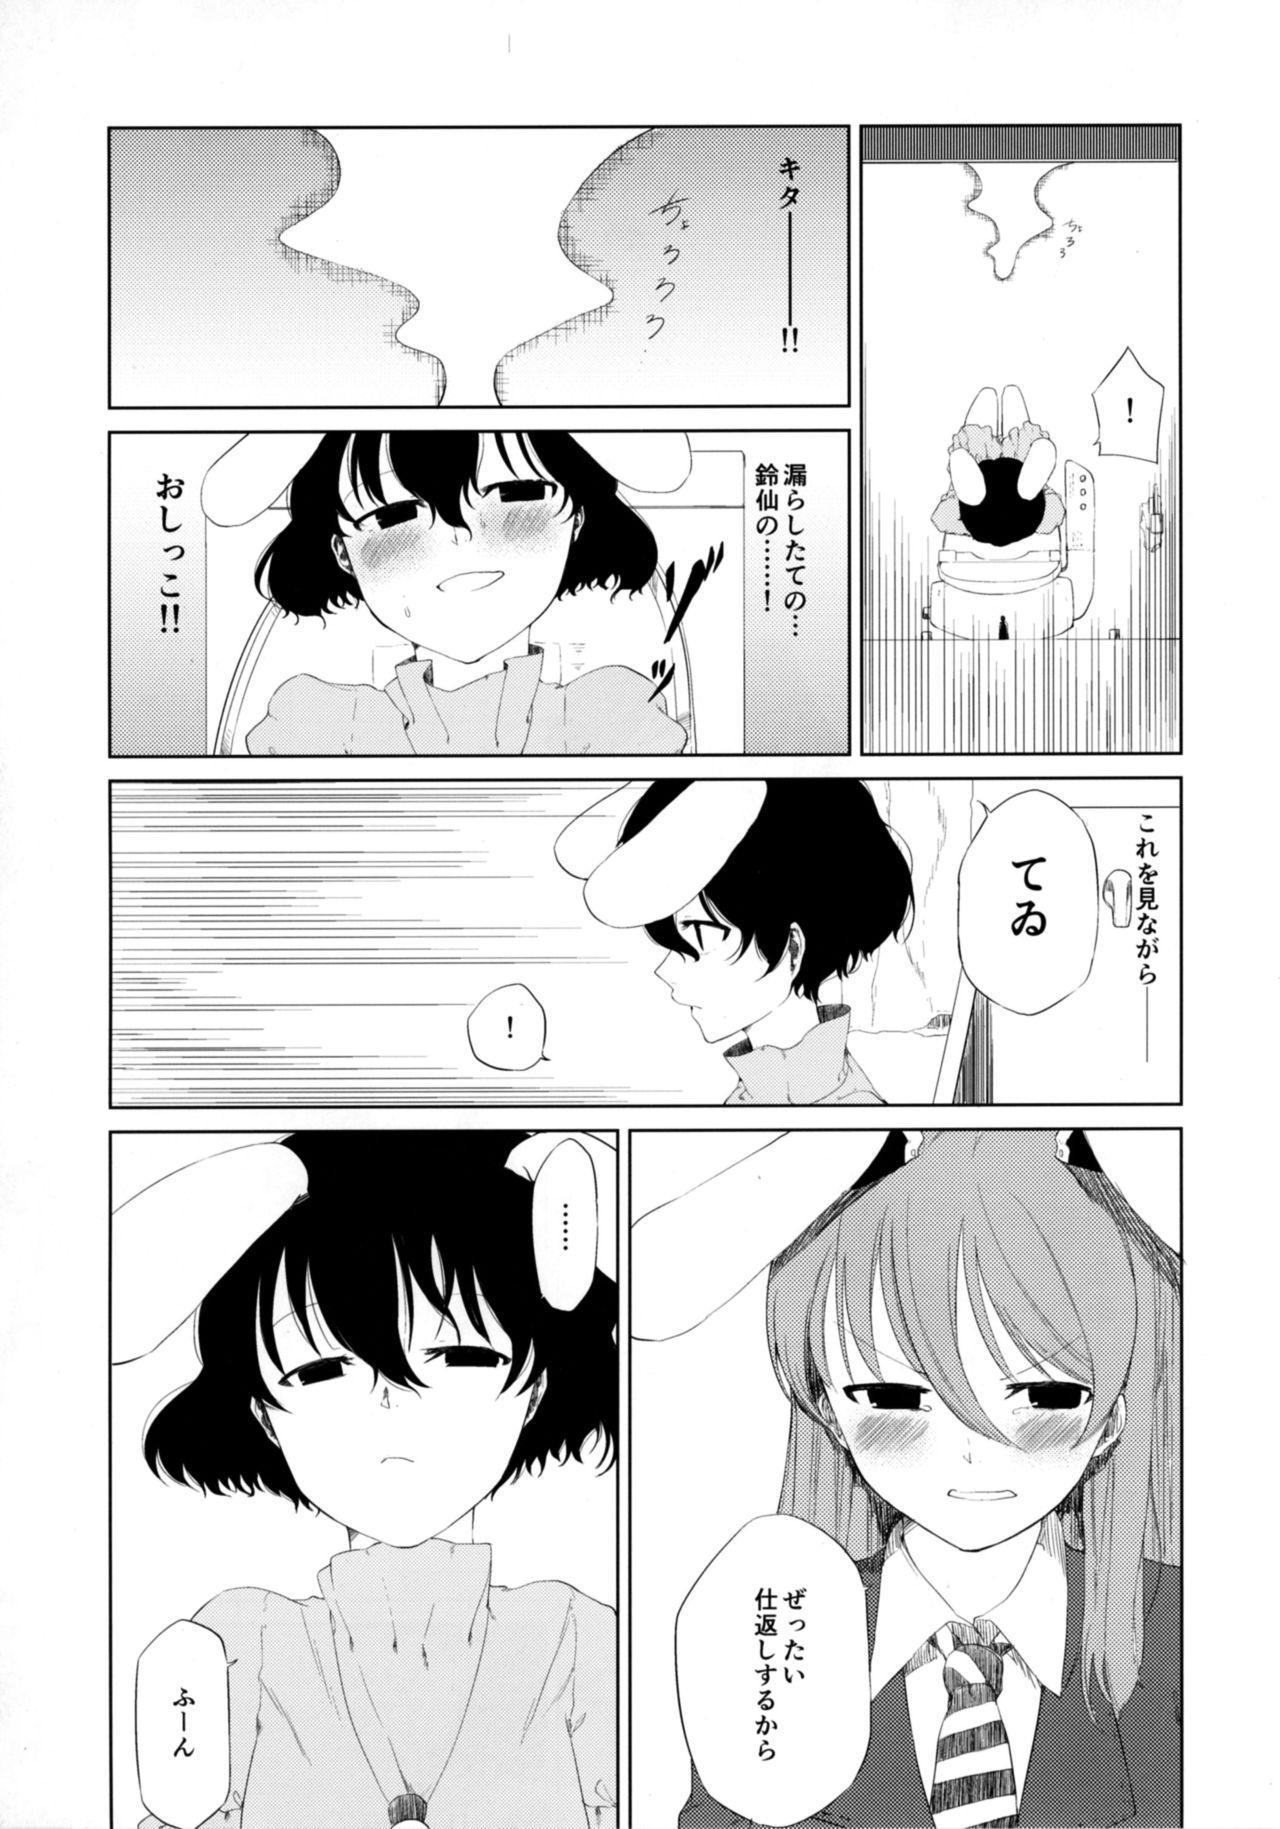 Aya to Tewi to Sanae to Udonge ga Omorashi Suru Hon!! 4